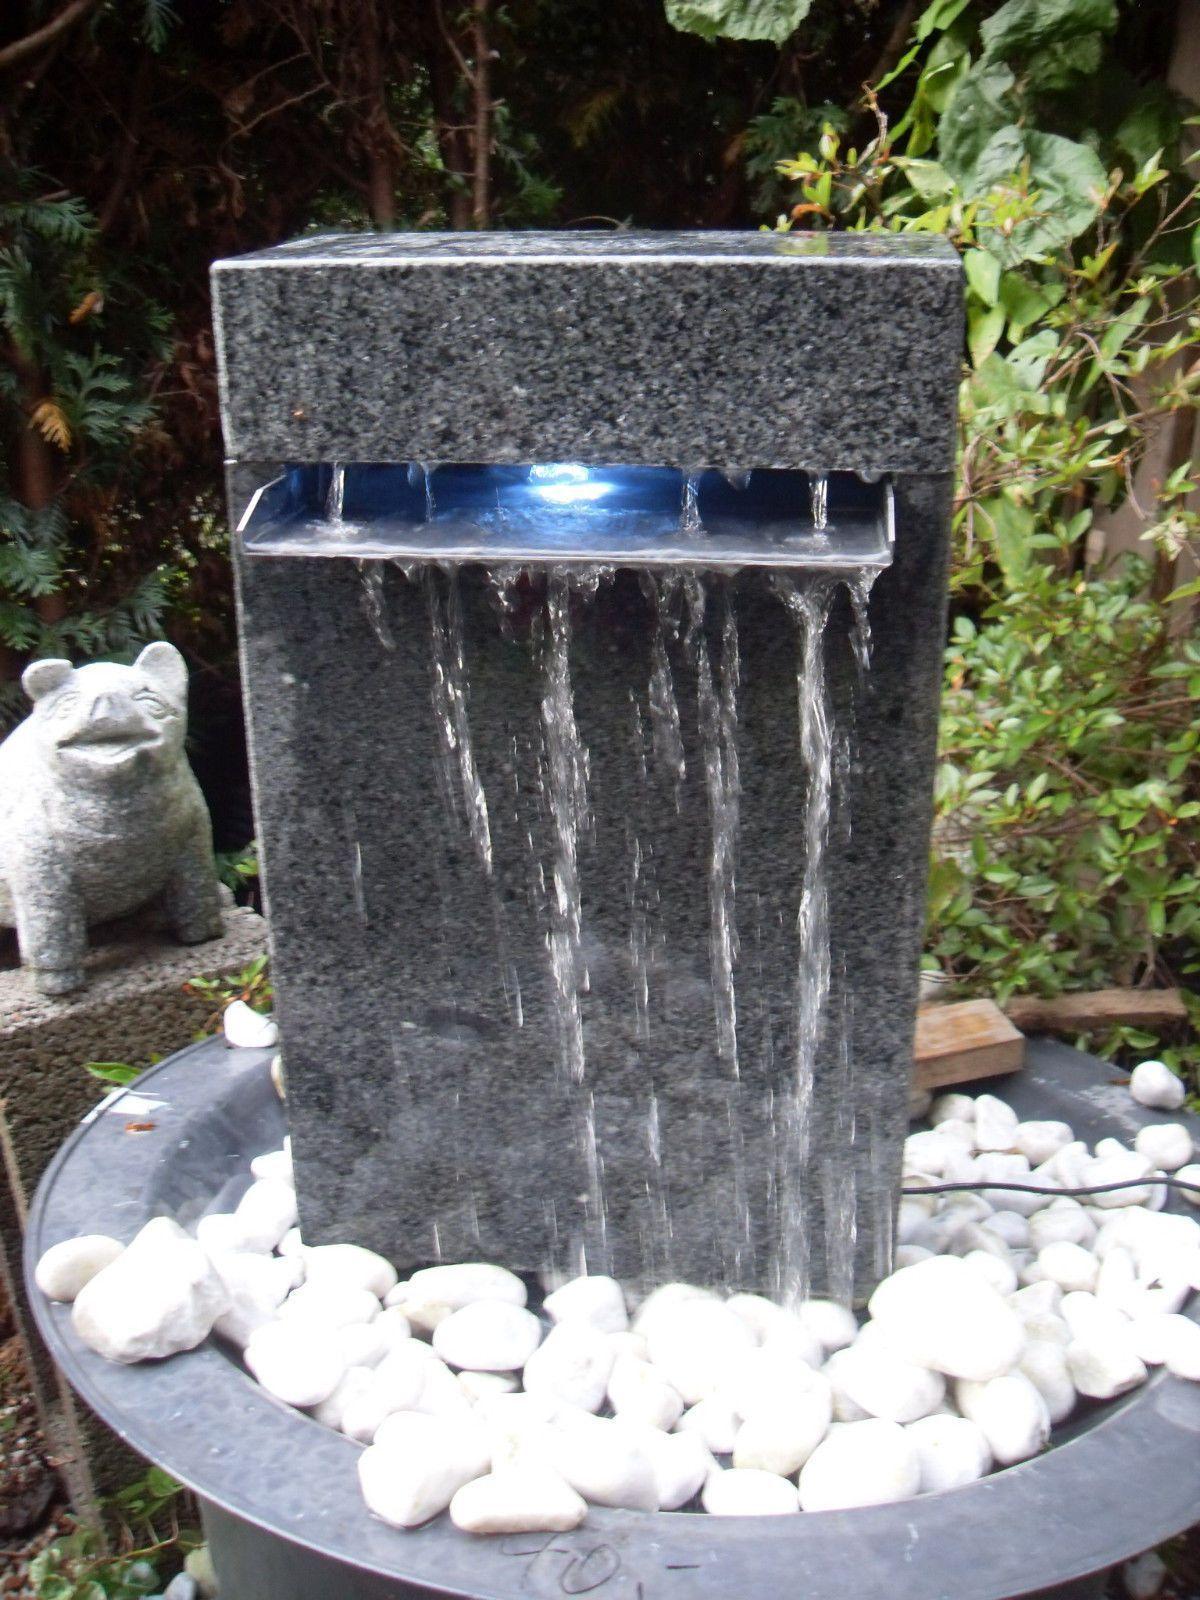 17 Brunnen Garten Granit Brunnen Garten Granit In 2020 Brunnen Garten Solarbrunnen Garten Brunnen